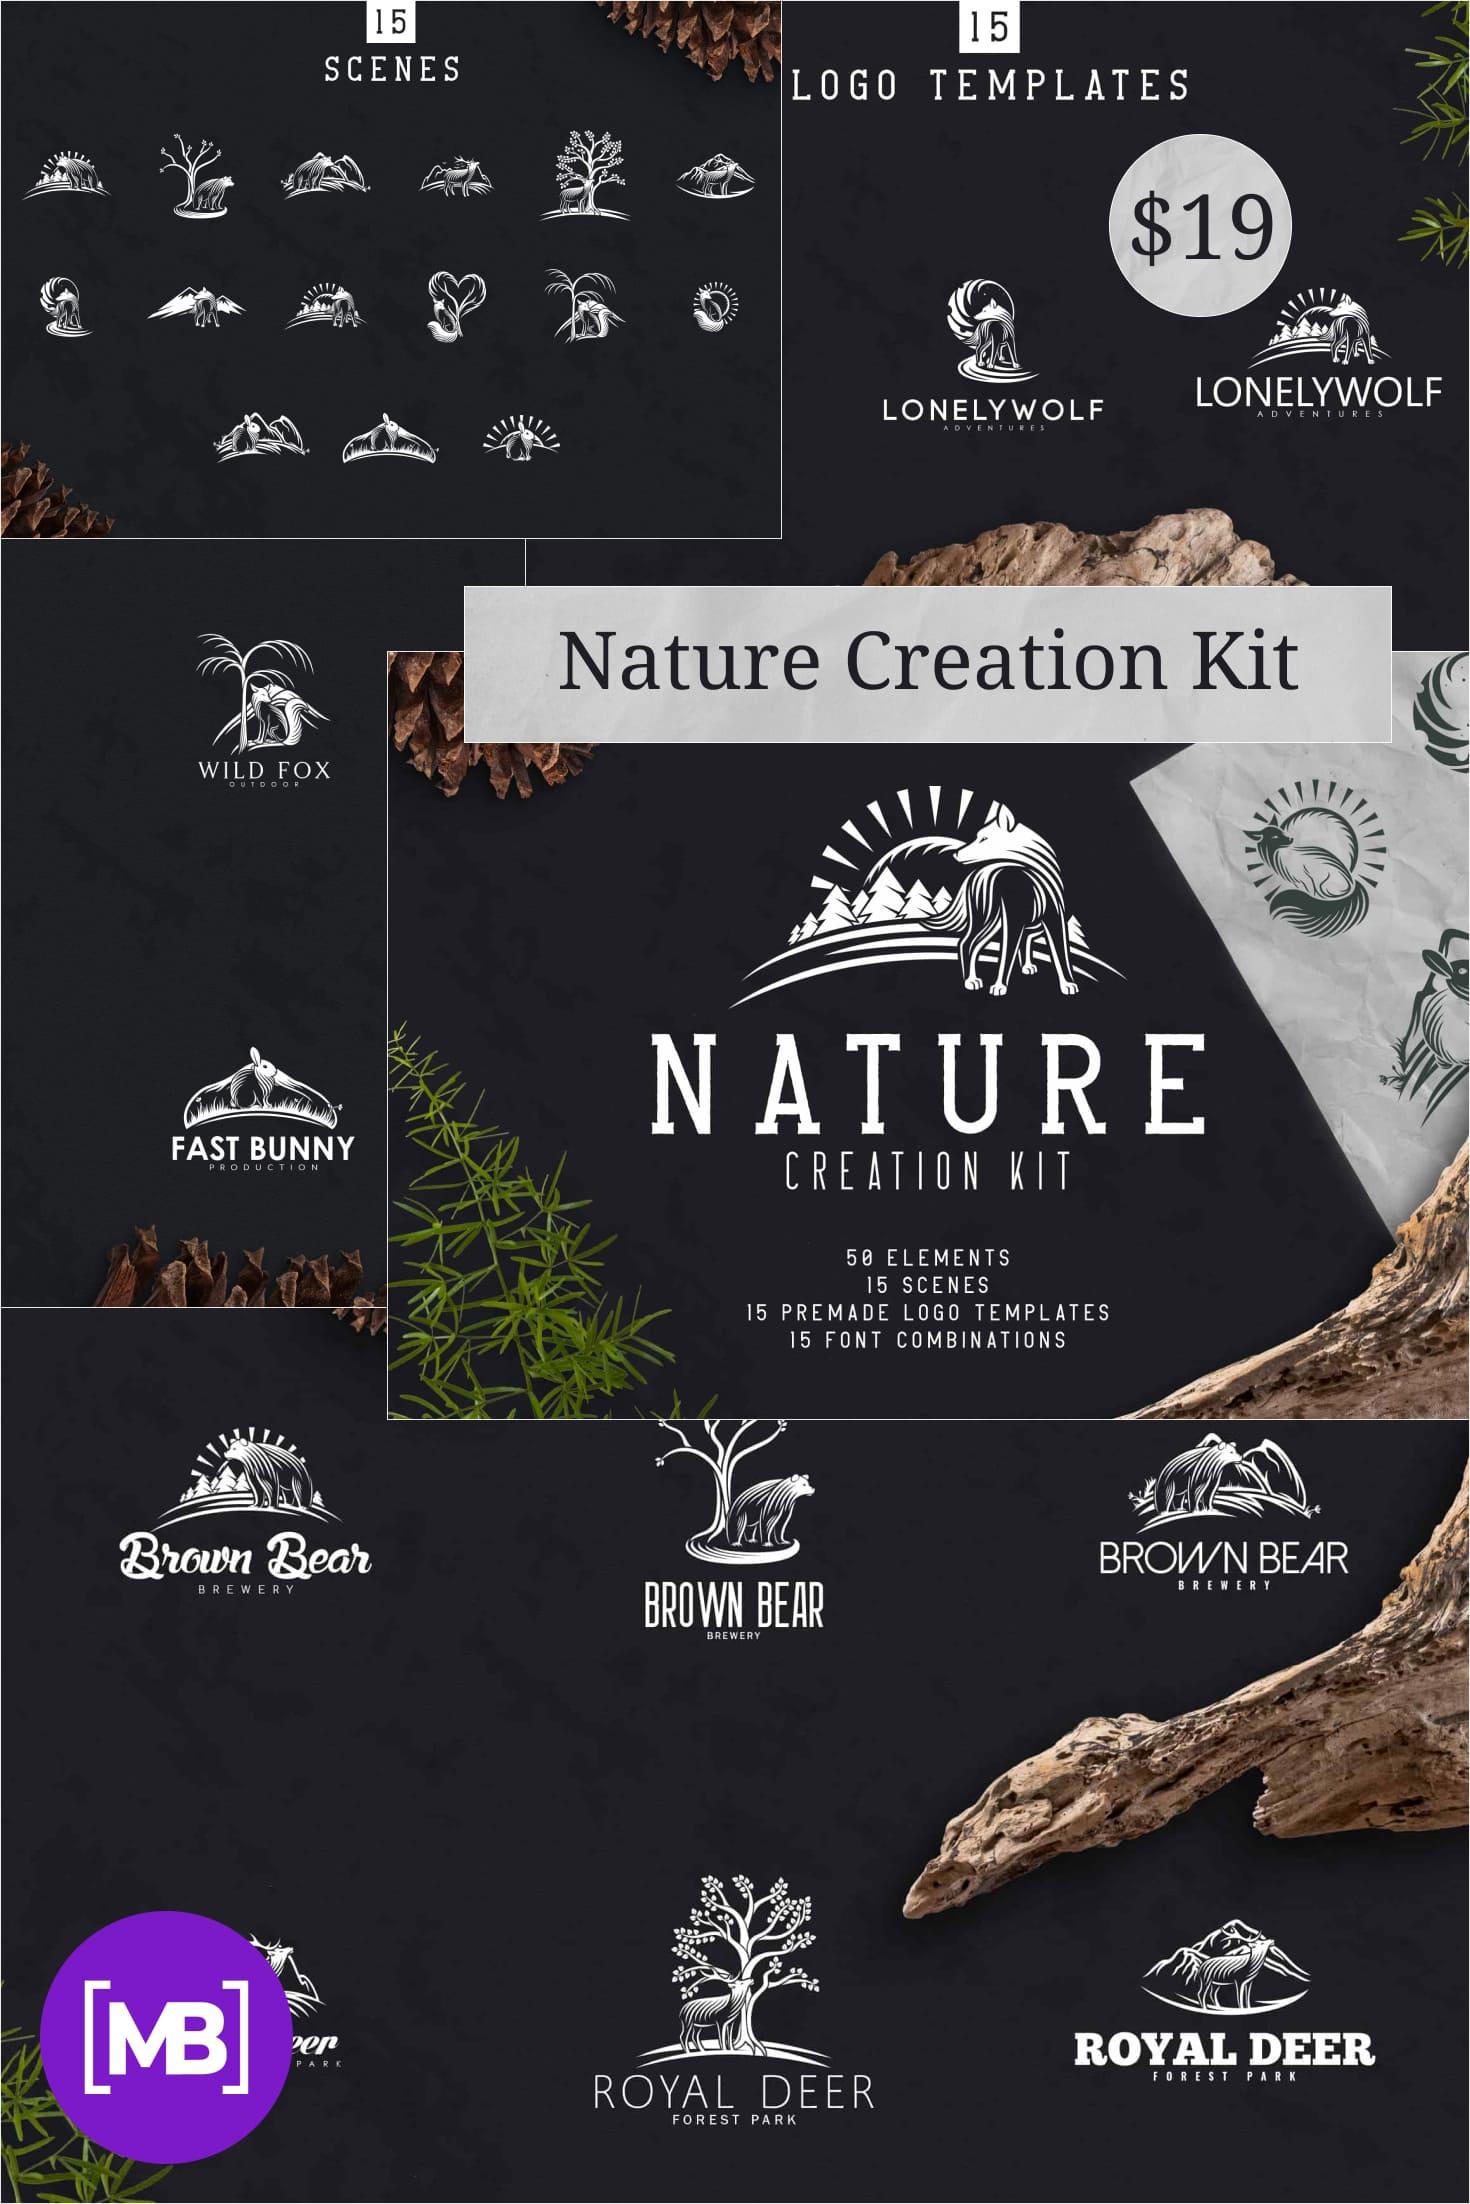 Nature Creation Kit: Fonts, Logo, Elements - $19. Collage Image.